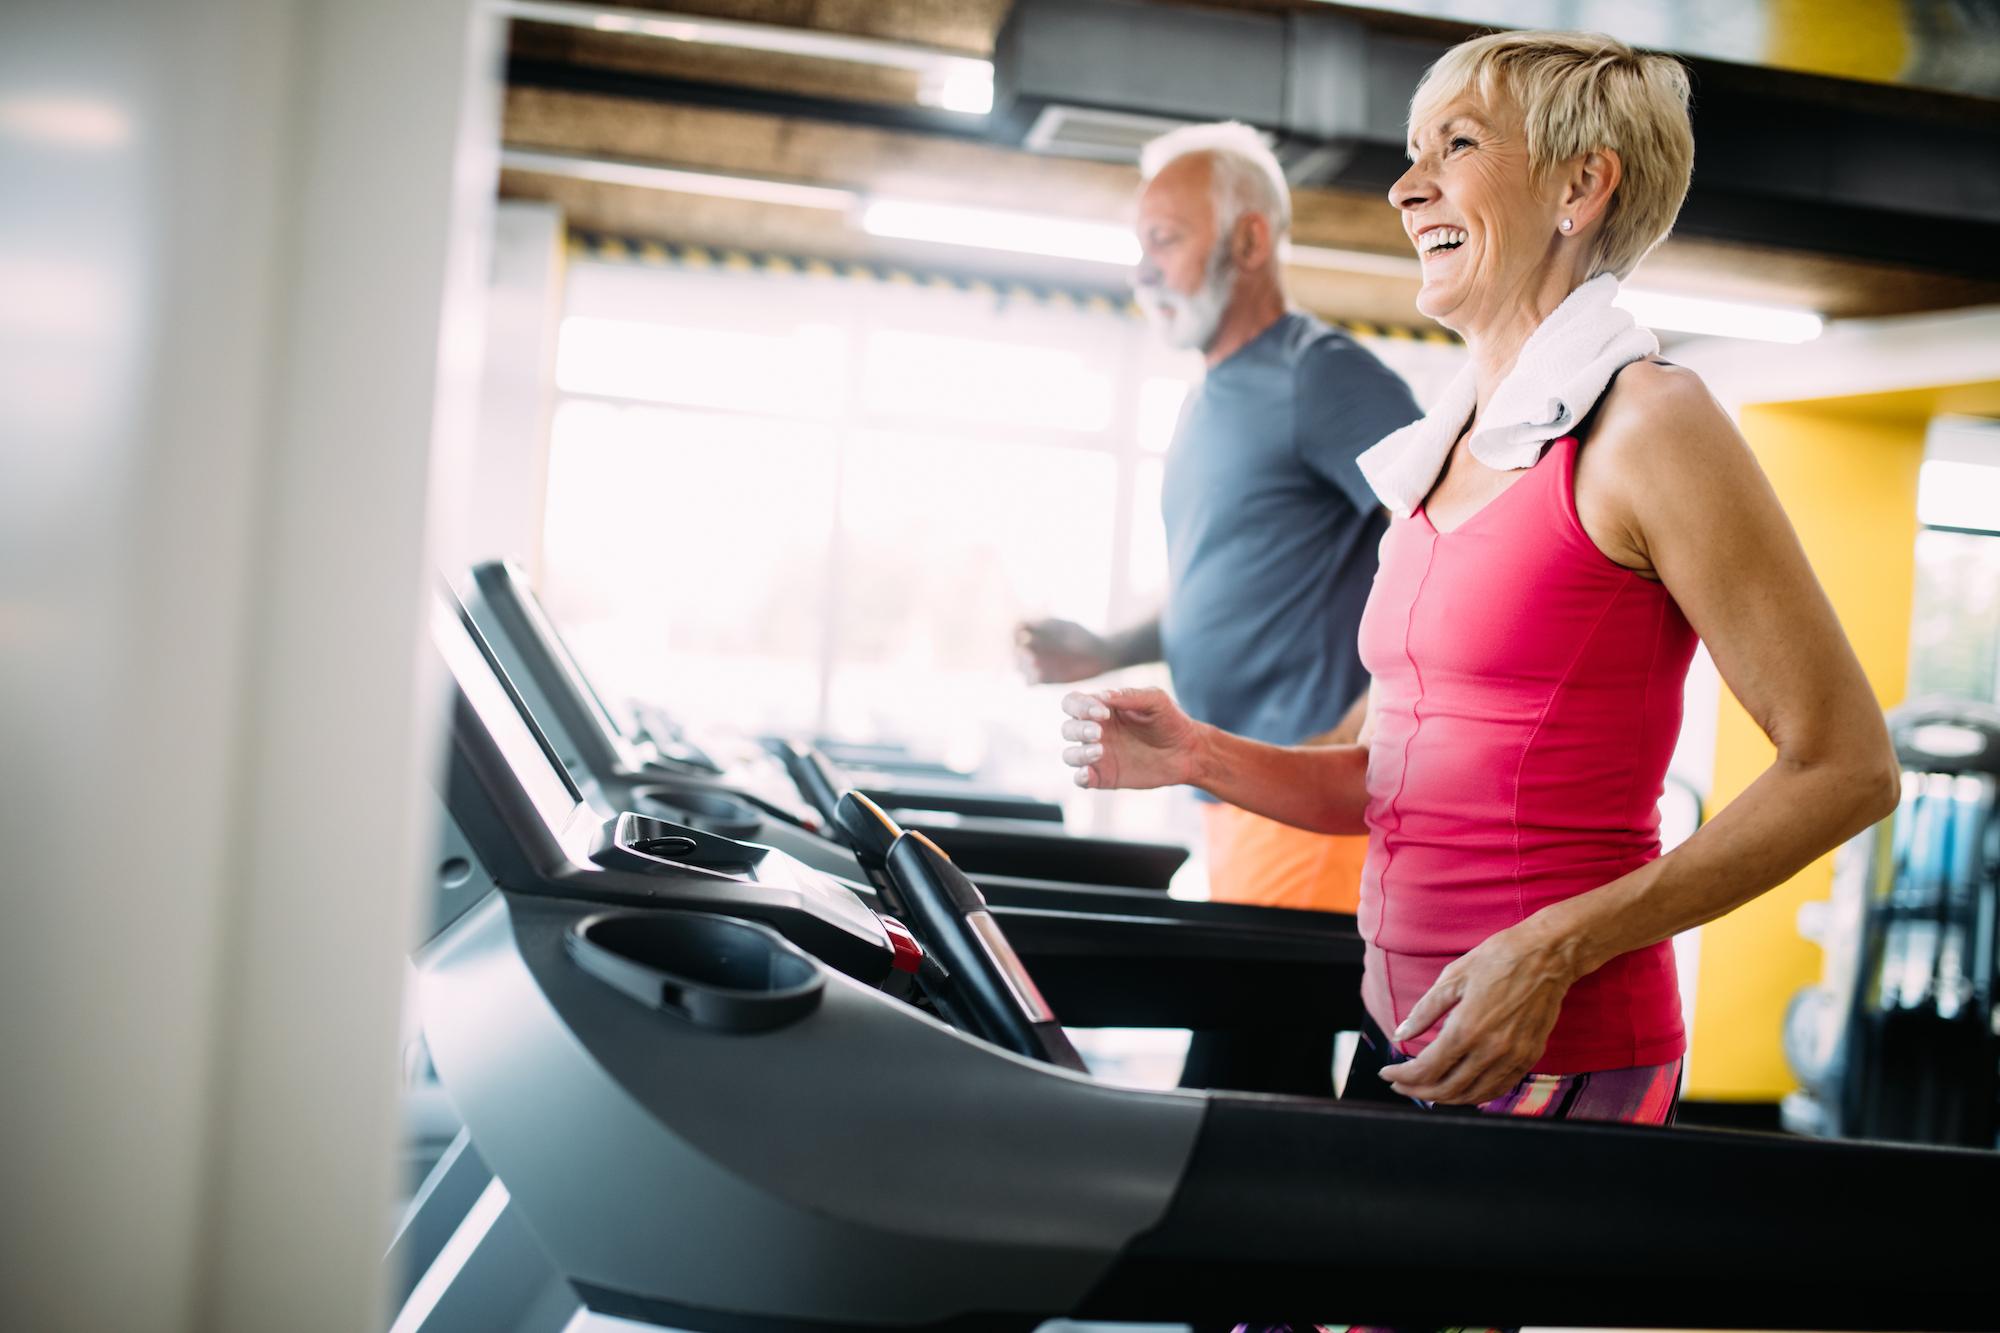 senior woman exercising on treadmill